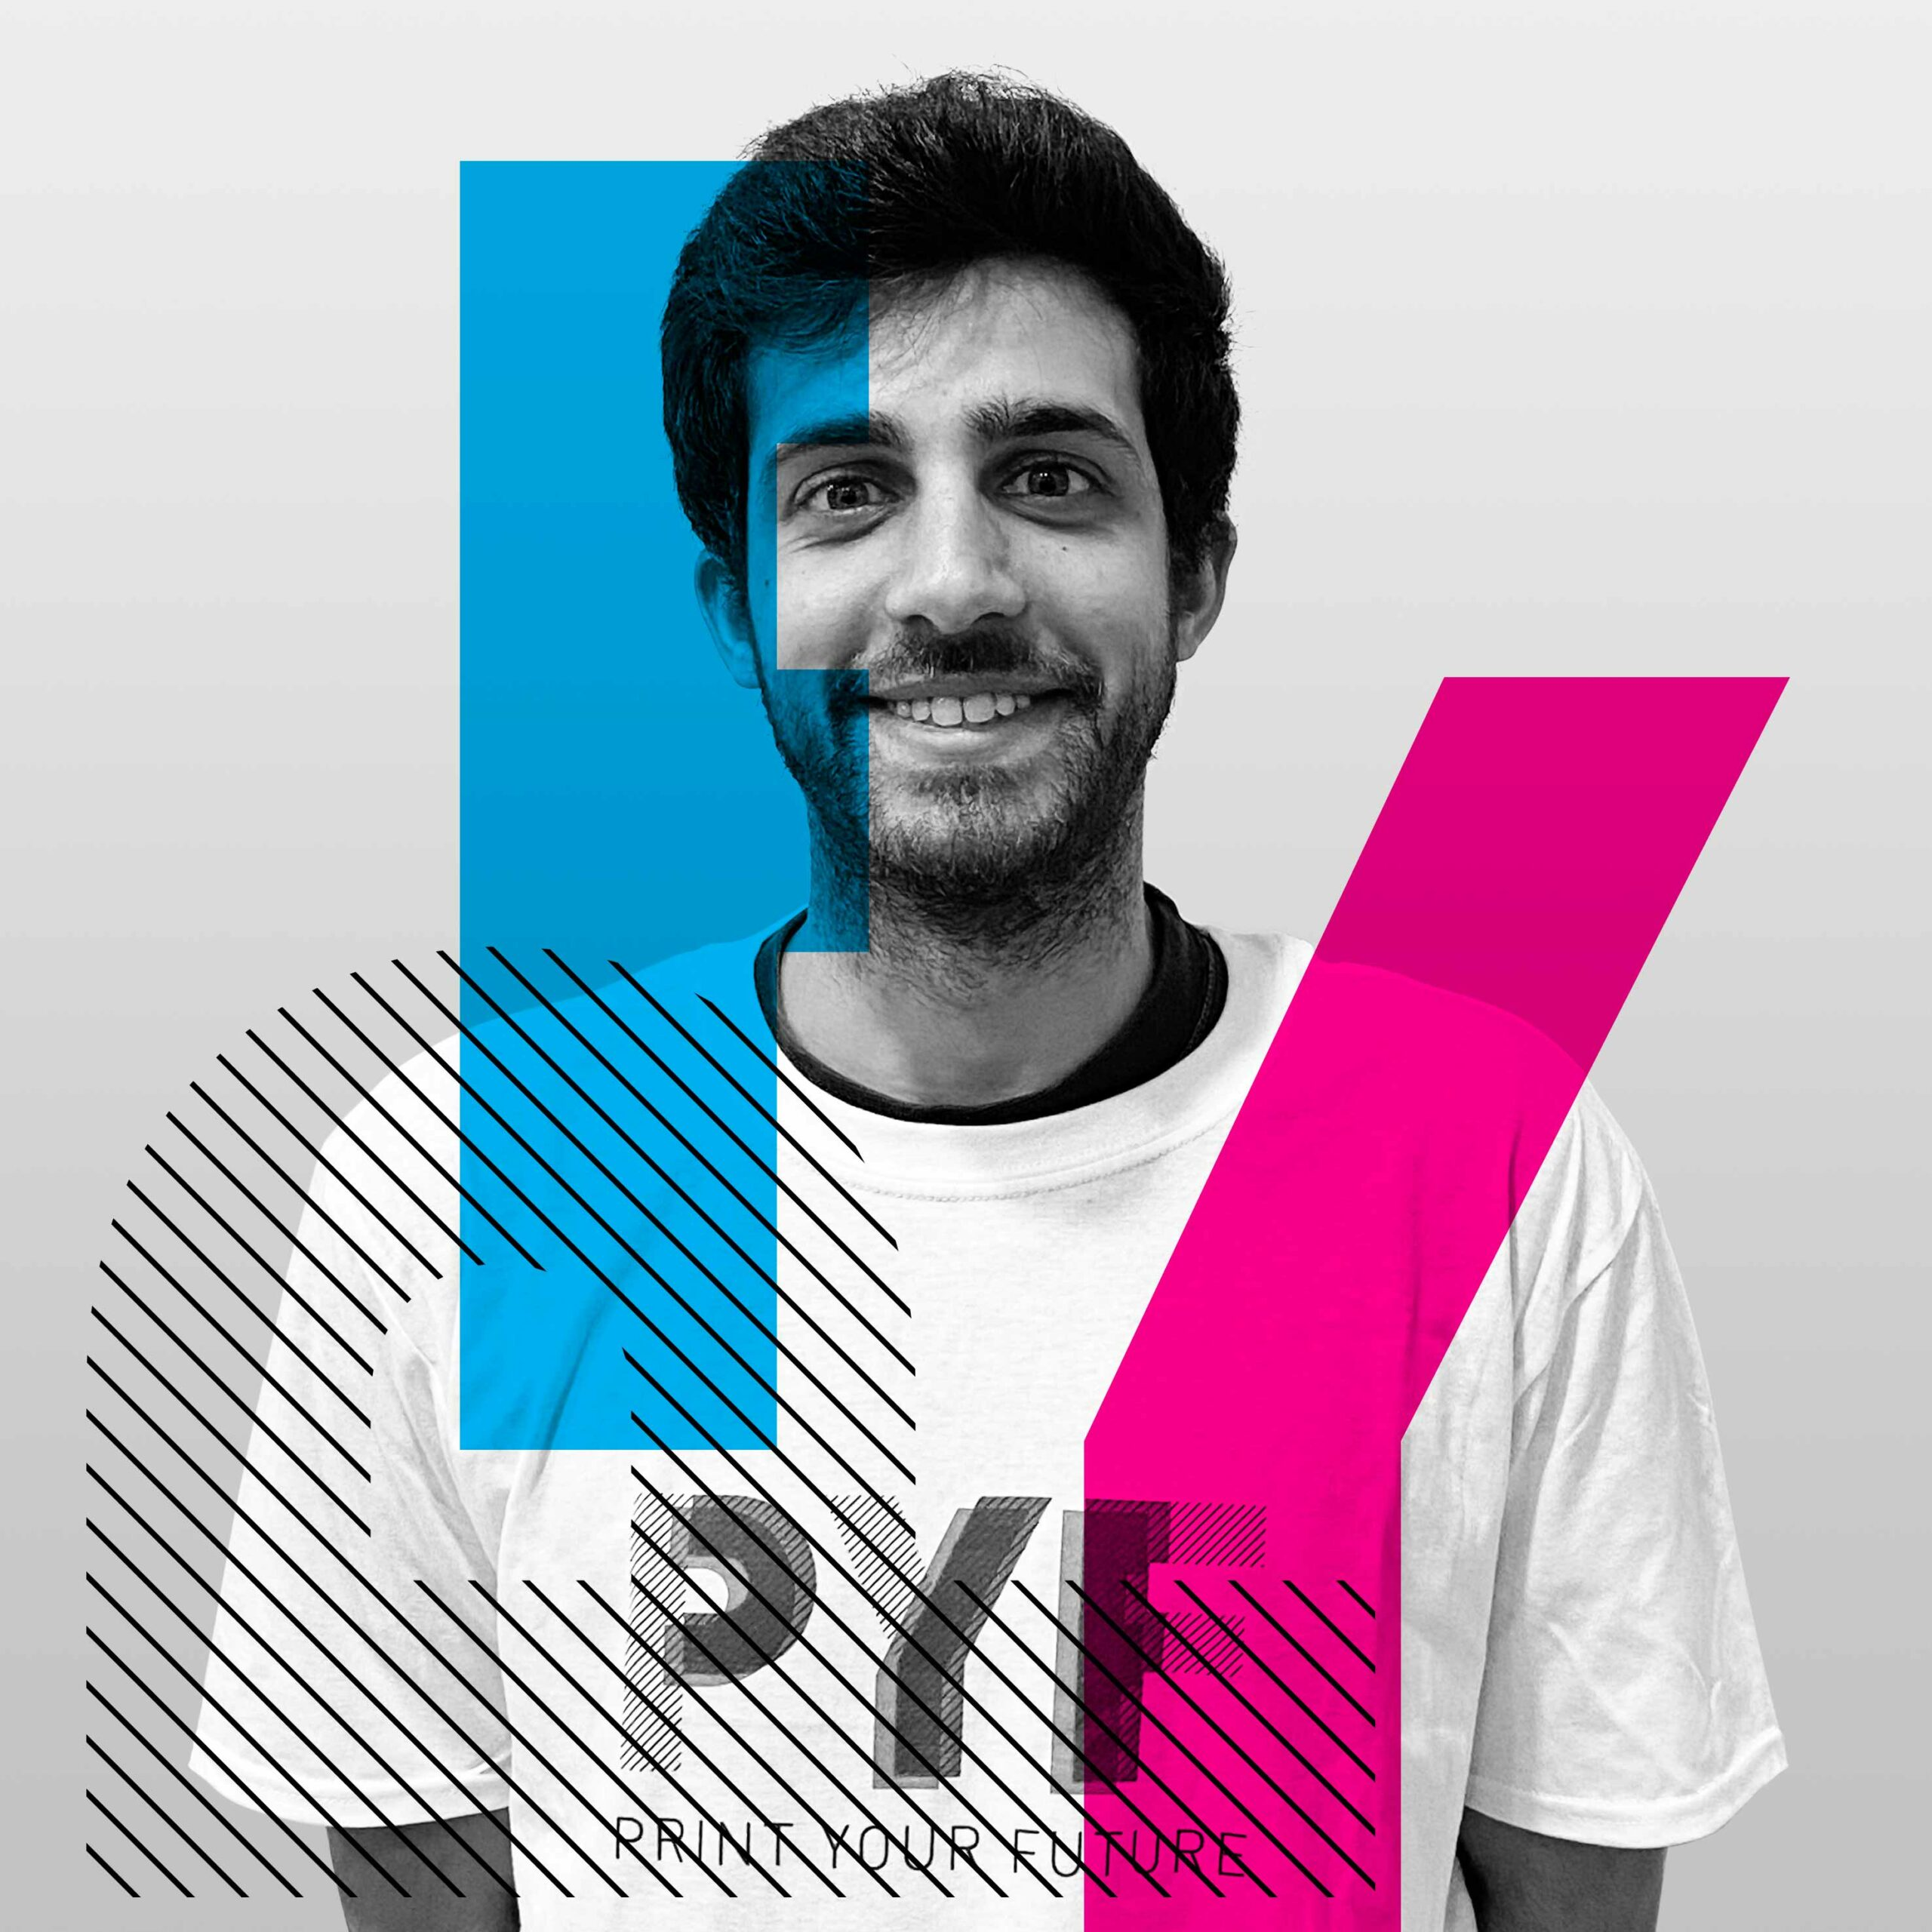 Andre-Figueirdo_livelli